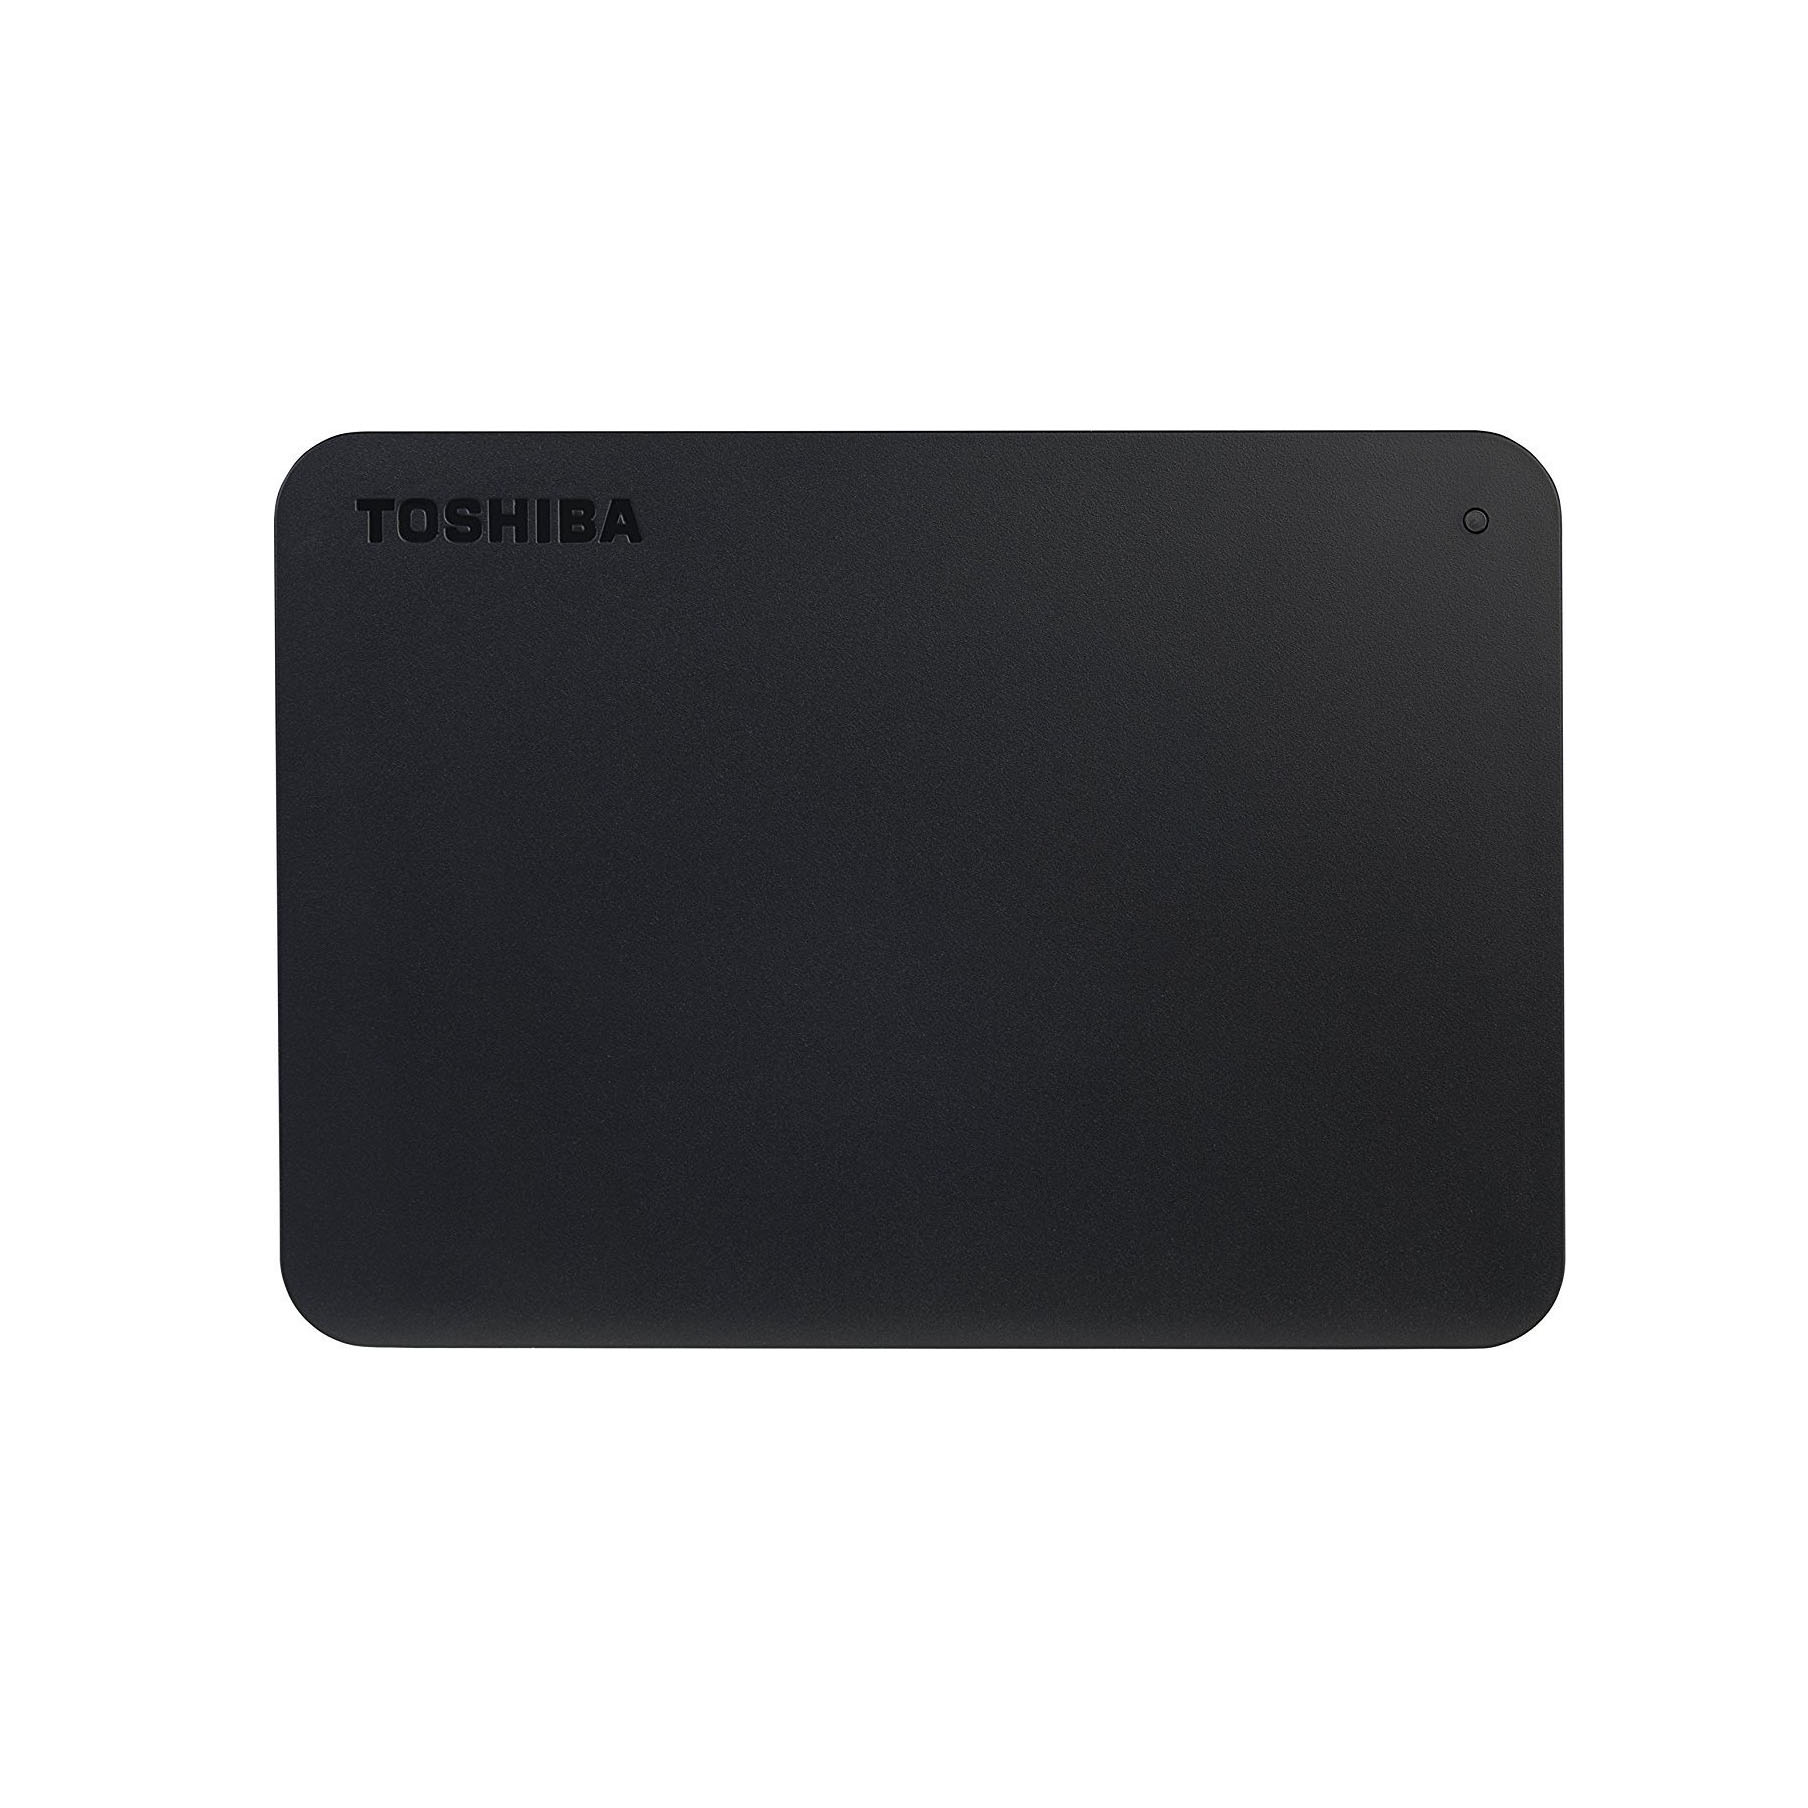 Toshiba Canvio Basics 2018 2TB Εξωτερικός Σκληρός Δίσκος 2.5'' USB 3.0 HDTB420EK3AA  Black